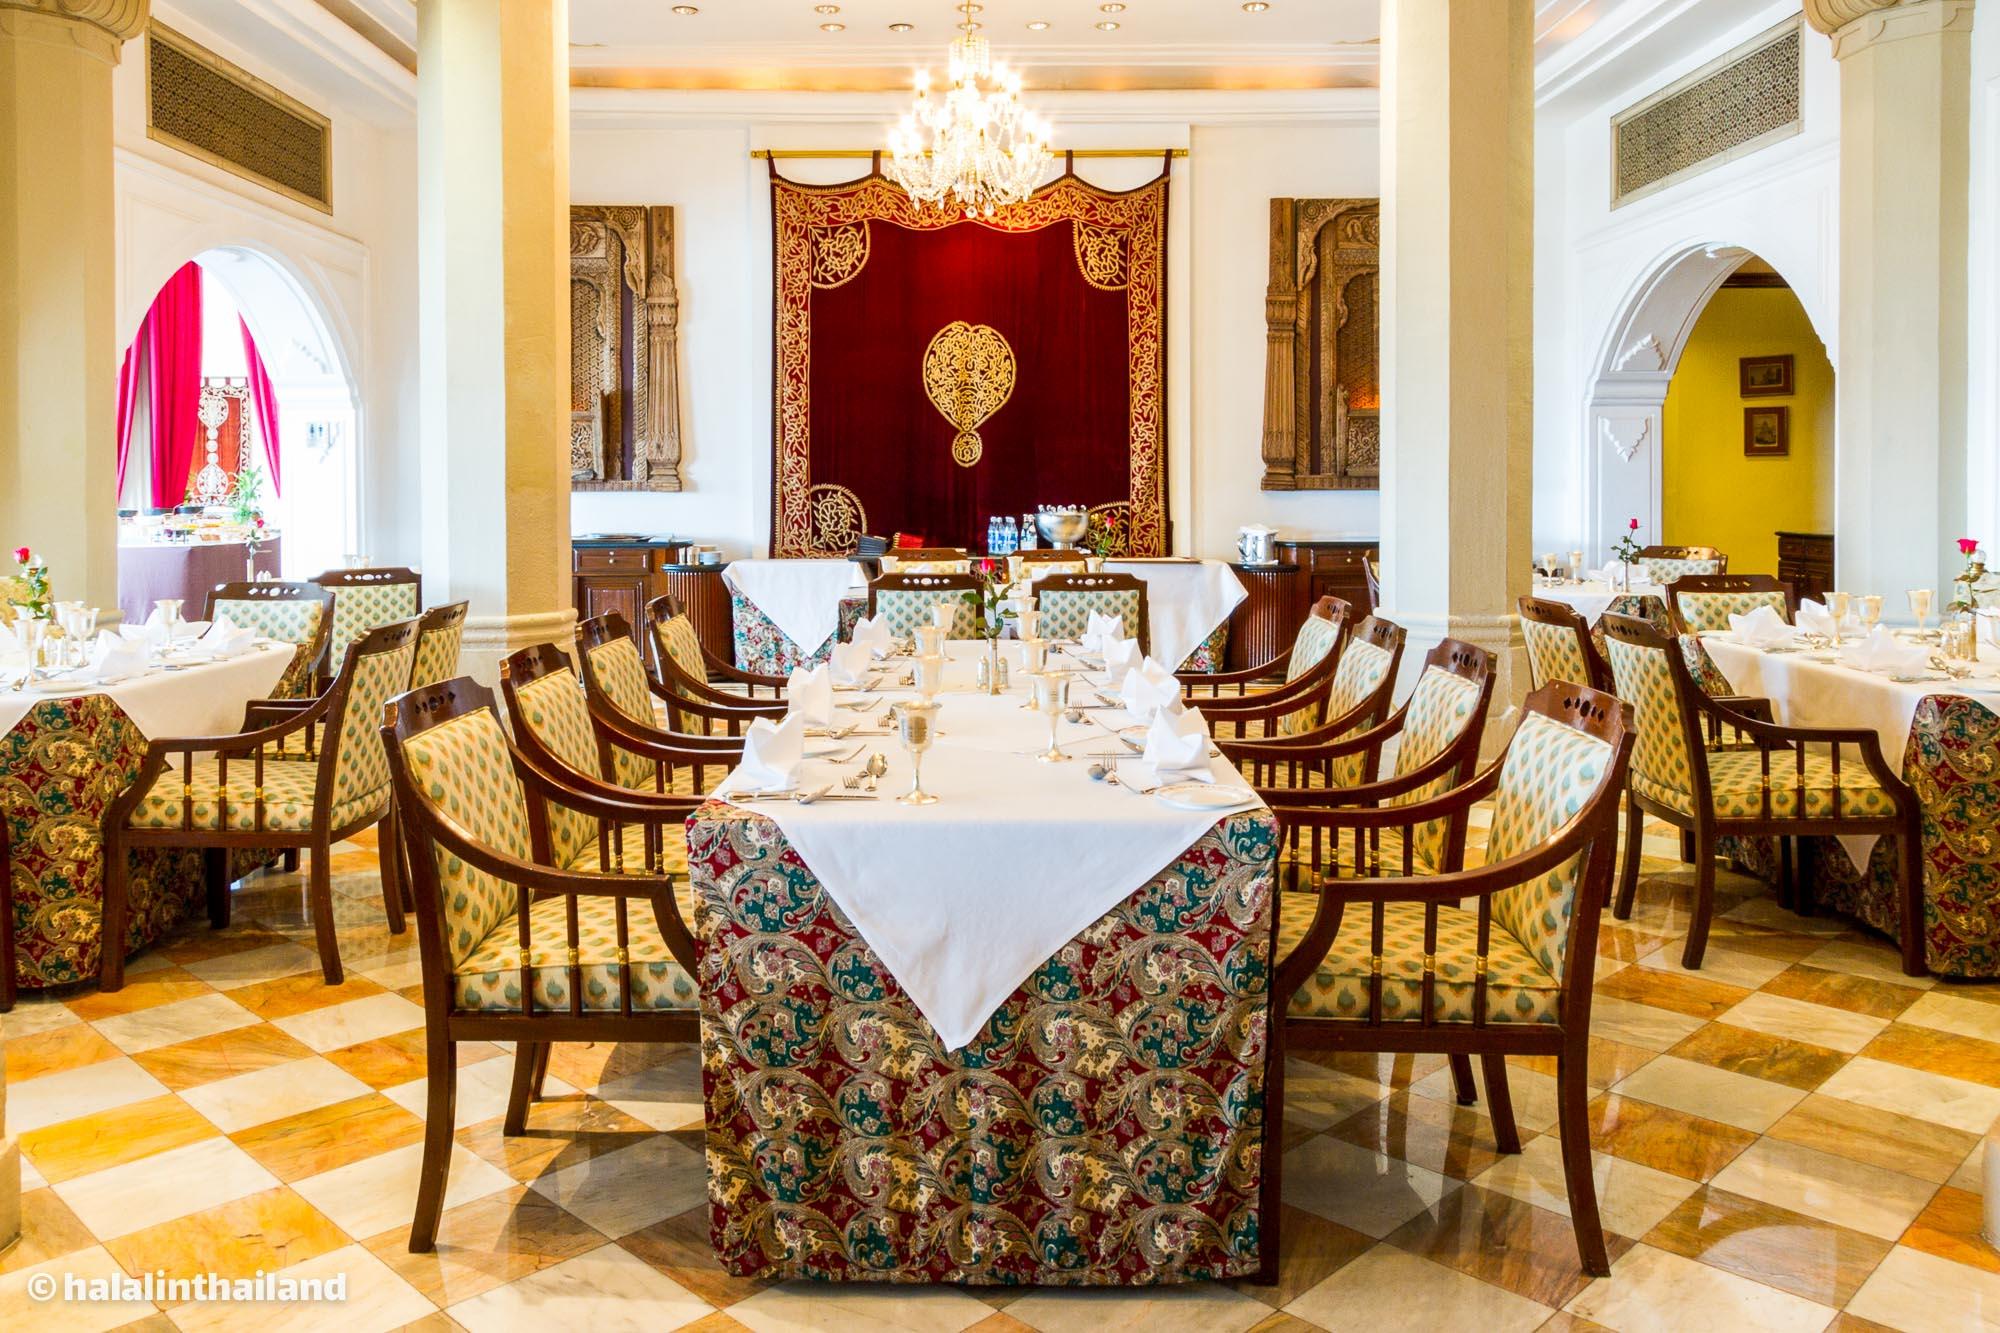 Rang Mahal รางมาฮาล โรงแรมแรมแบรนดท์ กรุเทพฯ